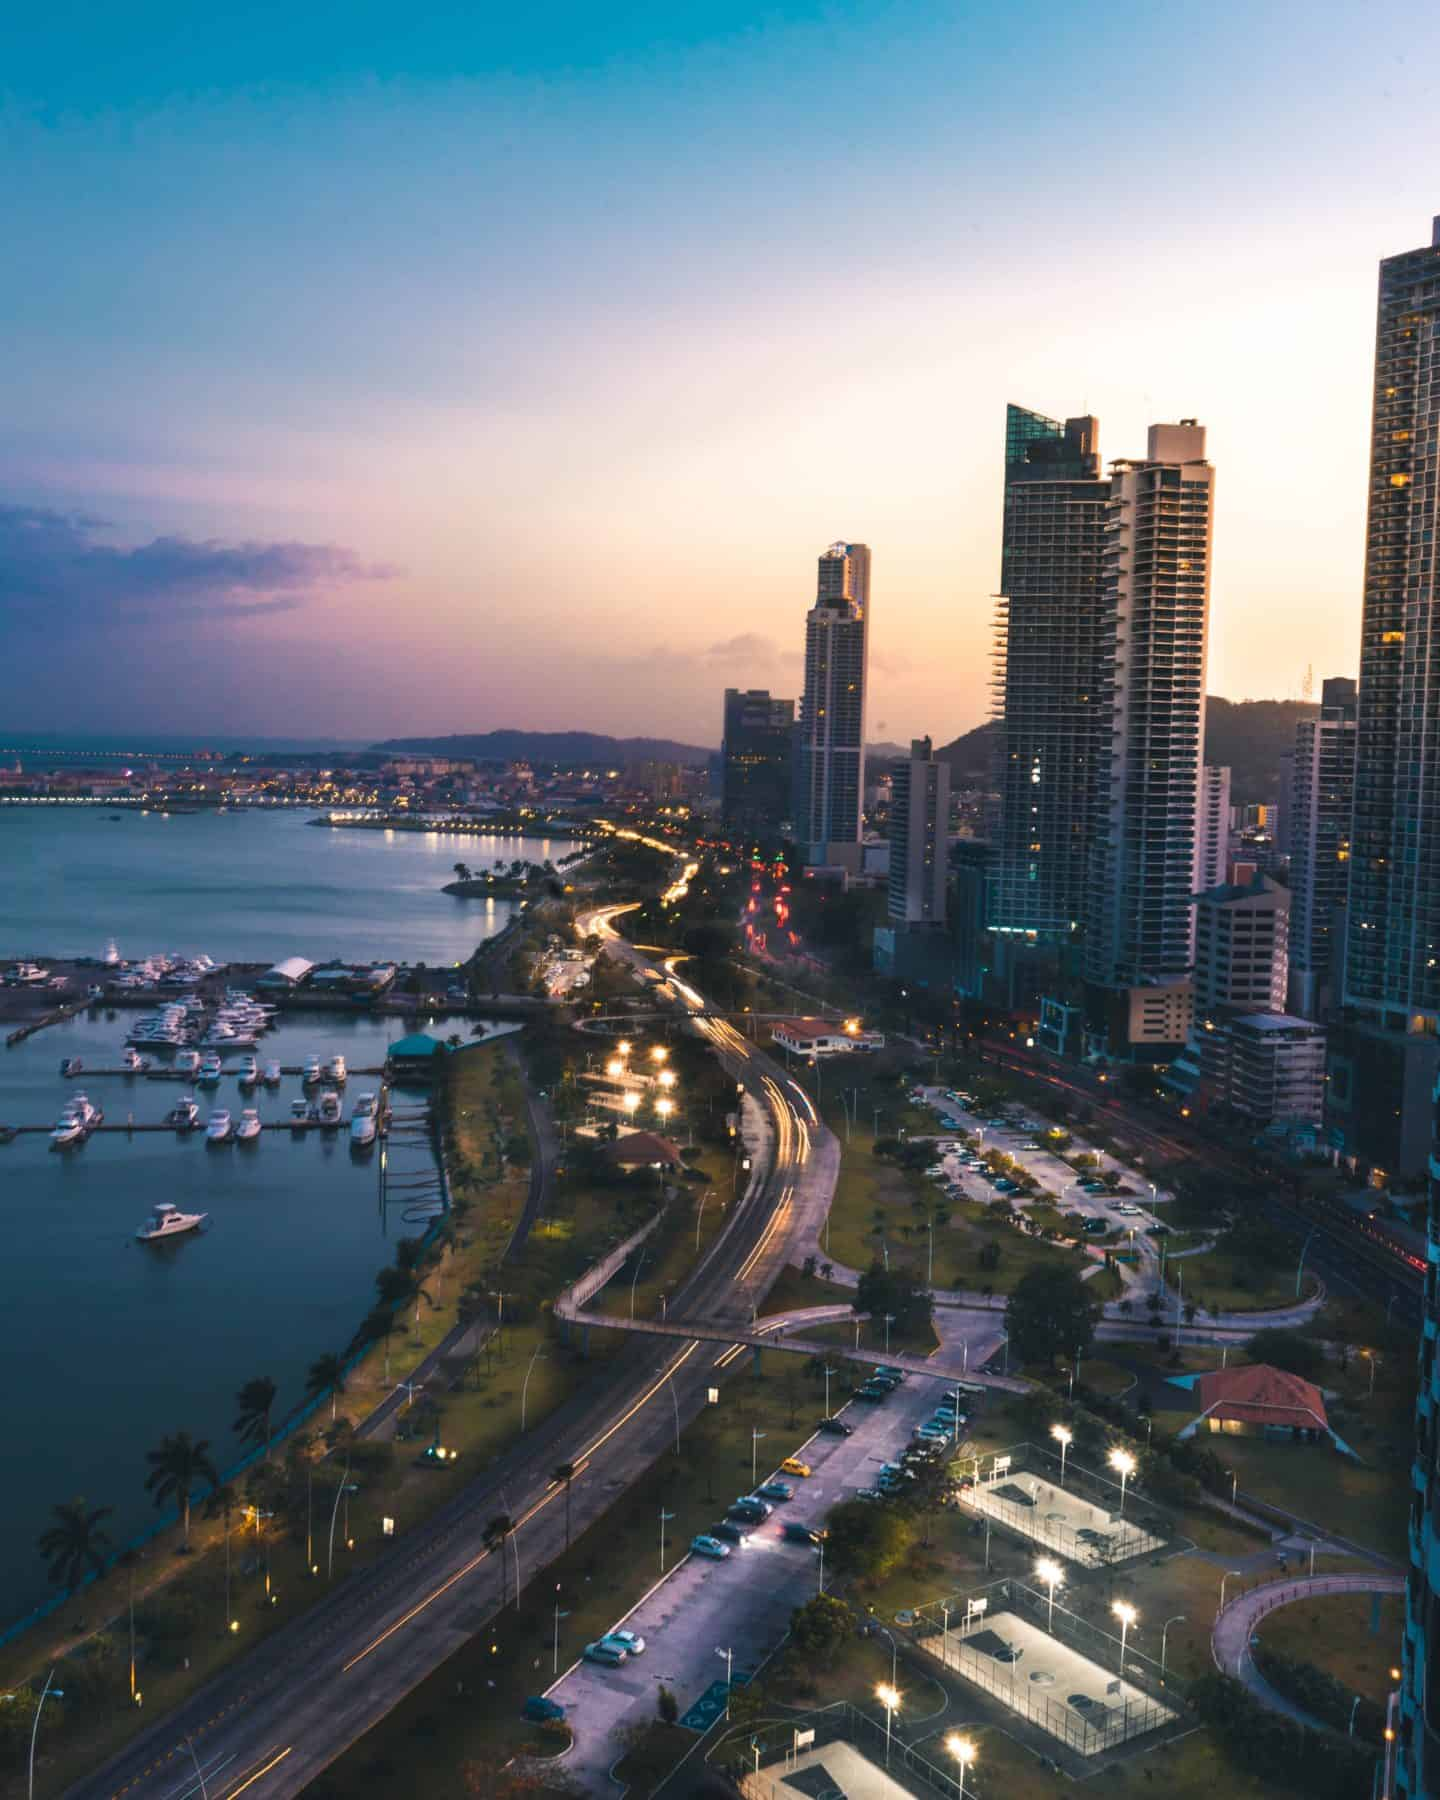 Panama, black expat friendly city